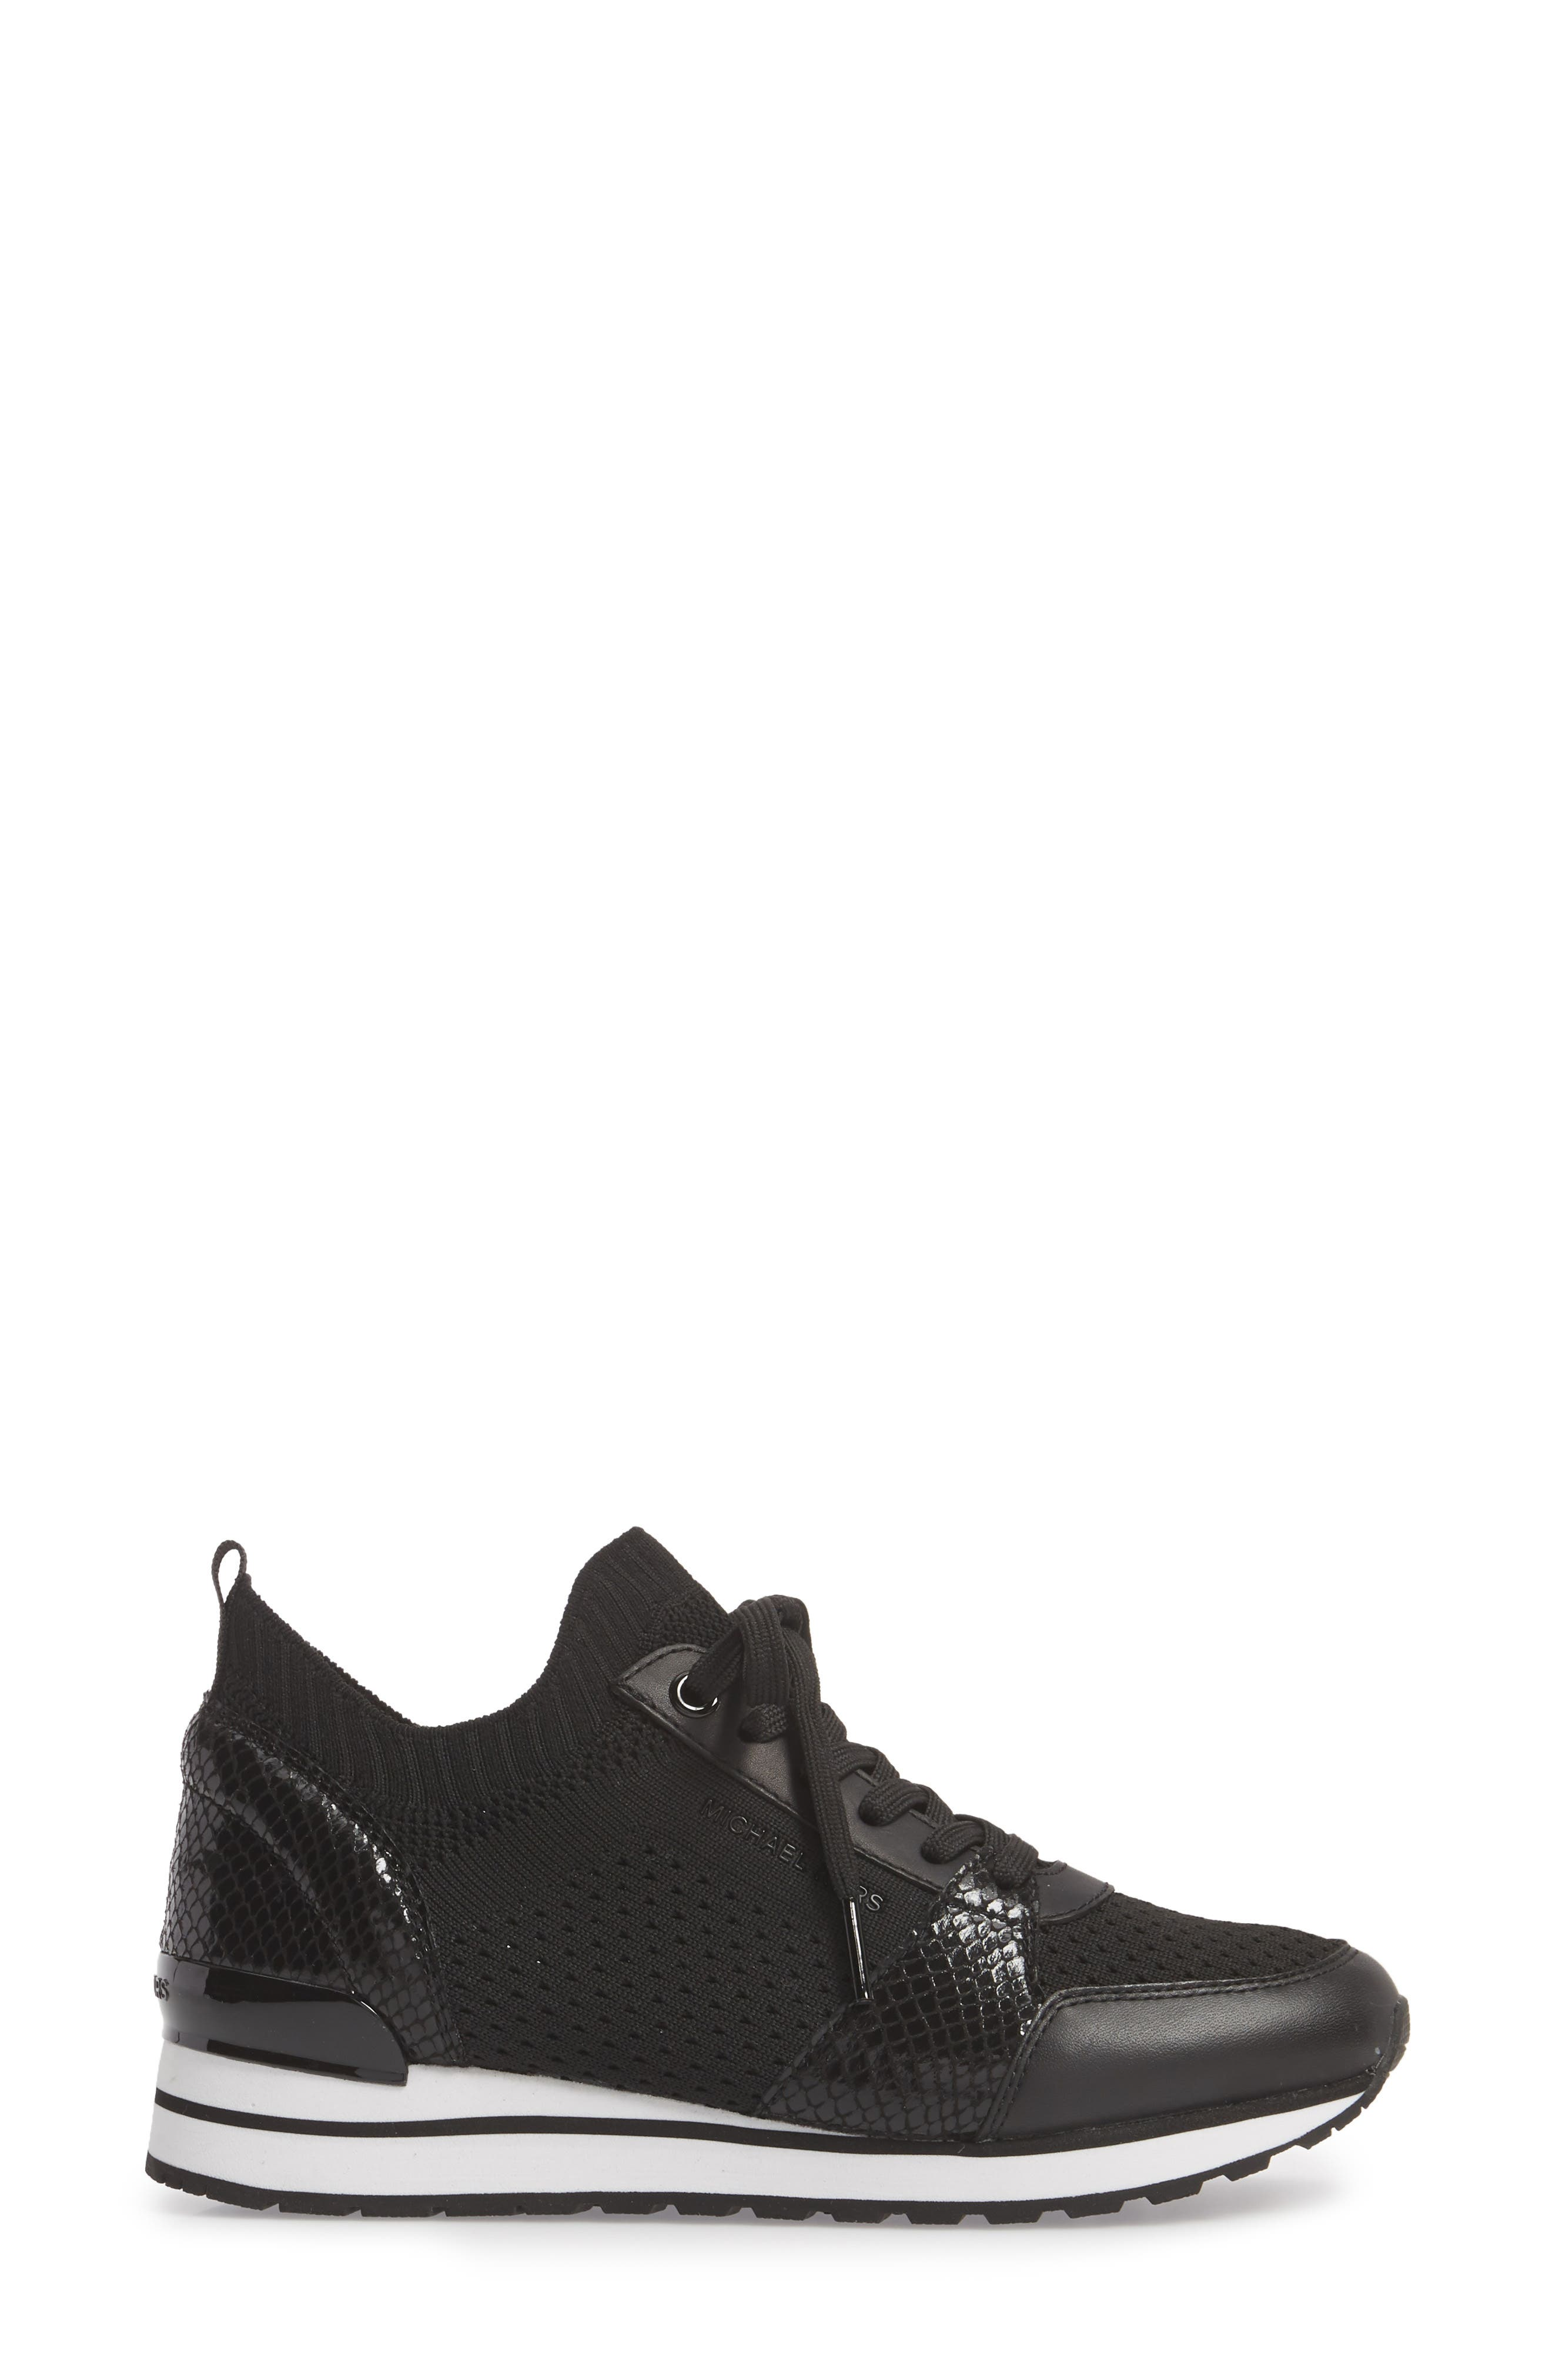 Billie Perforated Sneaker,                             Alternate thumbnail 3, color,                             002